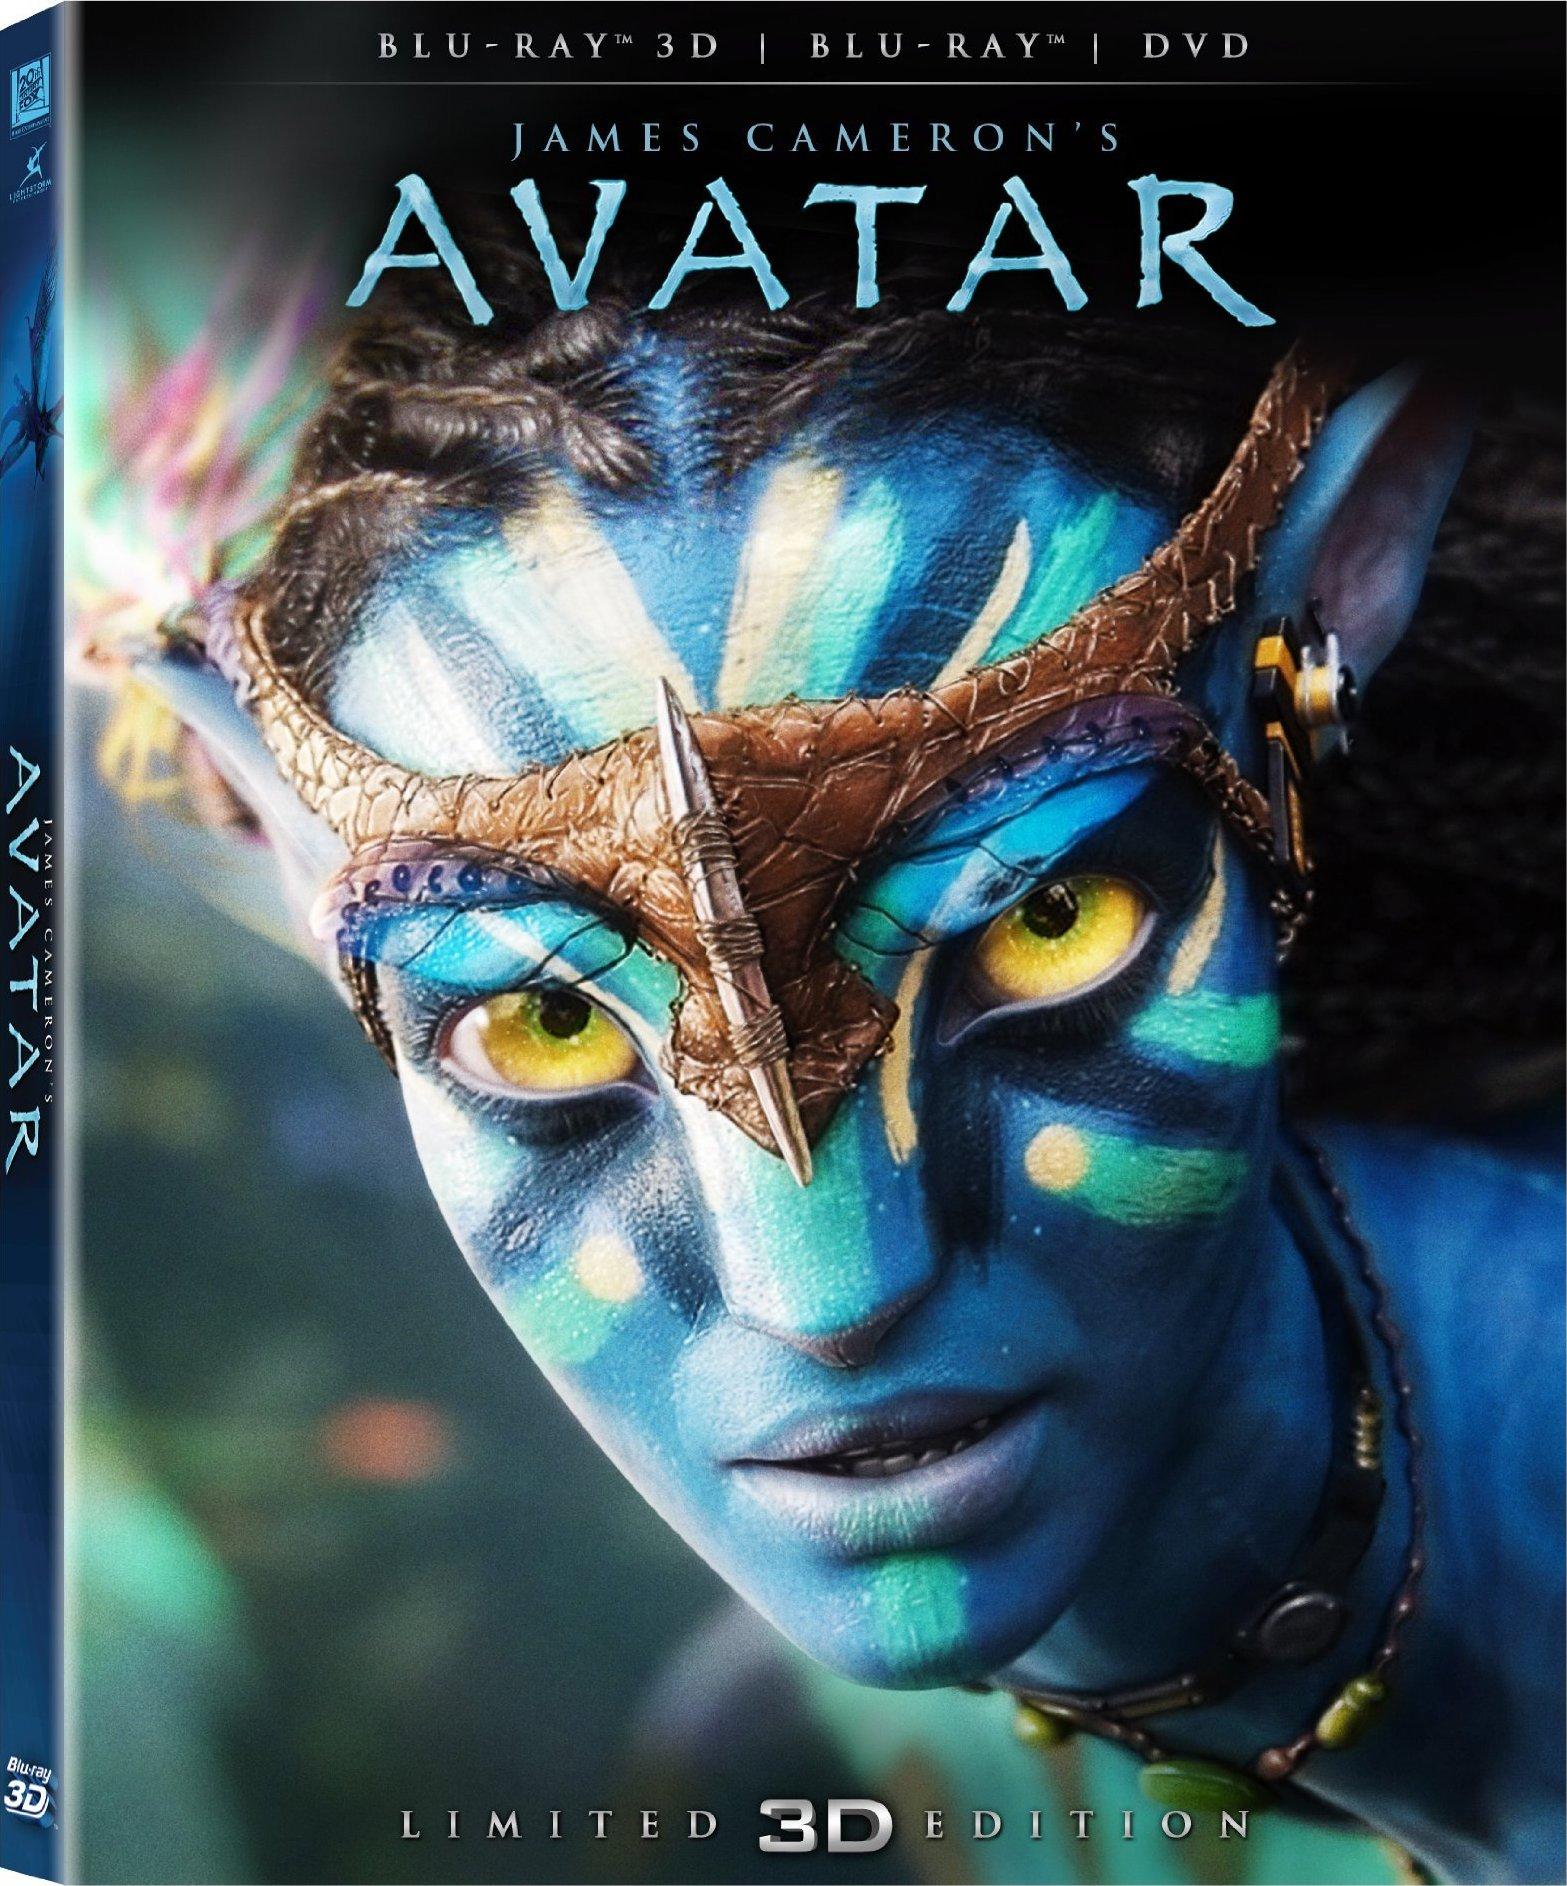 Avatar 2009 EXTENDED 1080p BluRay - مترجم -- Seeders: 1 -- Leechers: 0